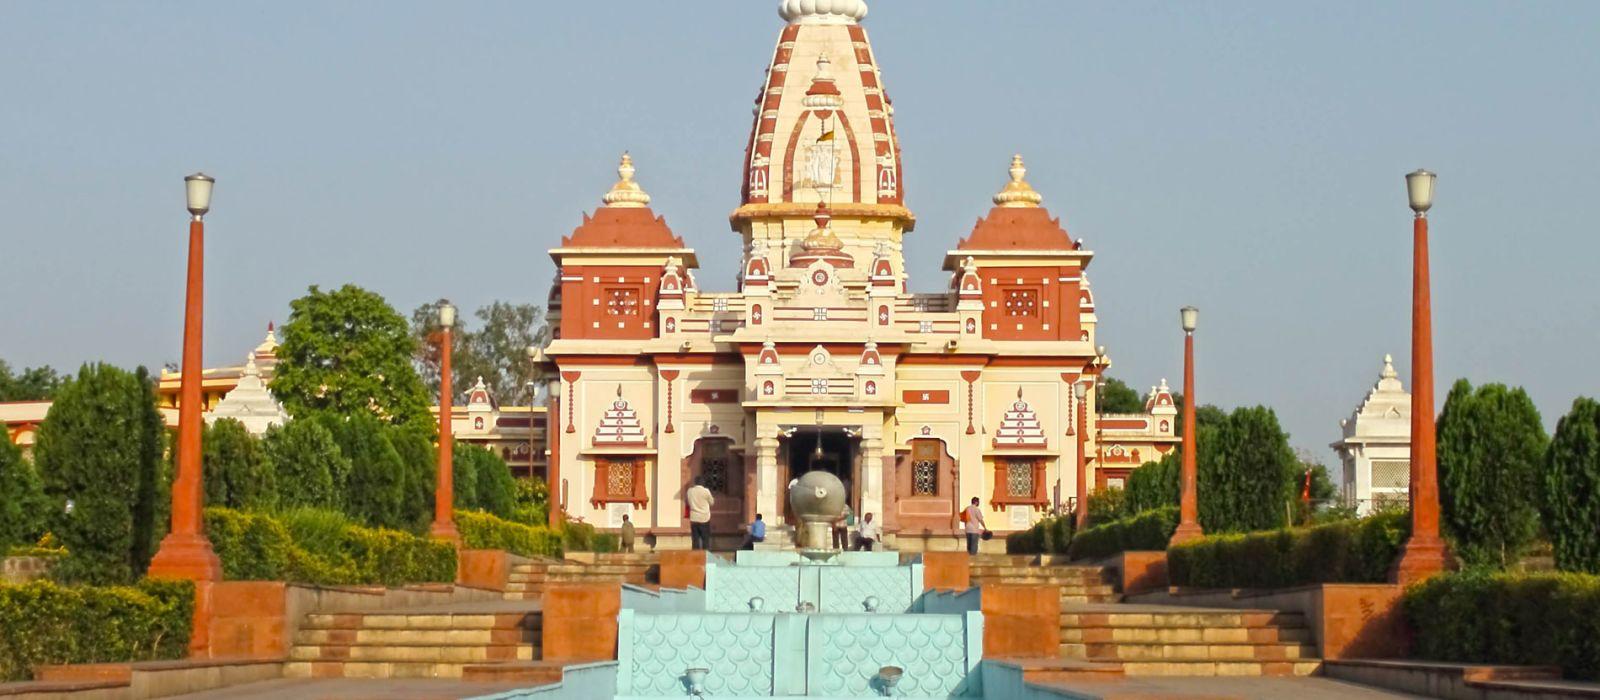 Destination Bhopal Central & West India